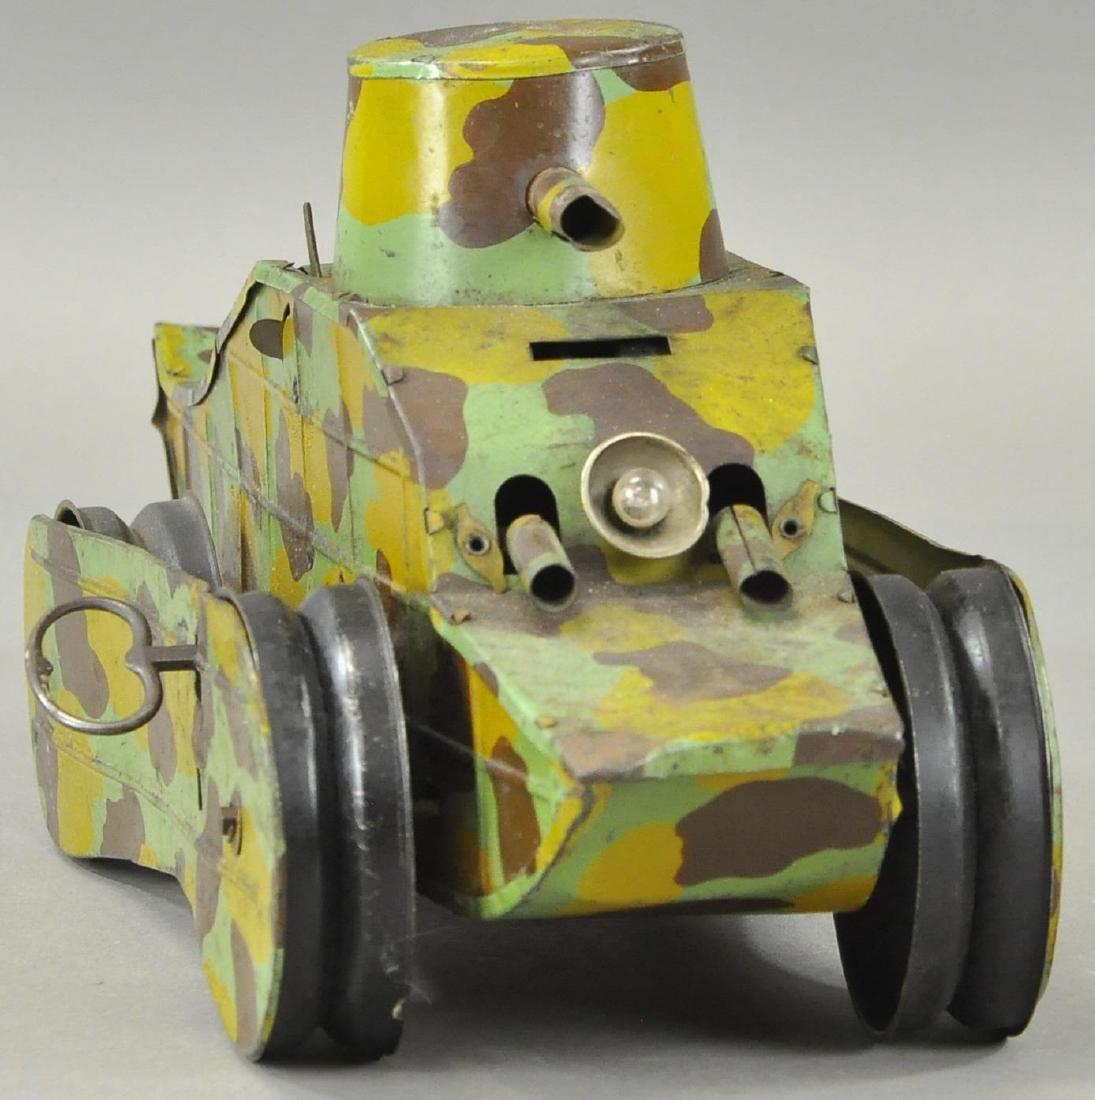 FRENCH WW1 CRAWLING ARMY TANK - 2